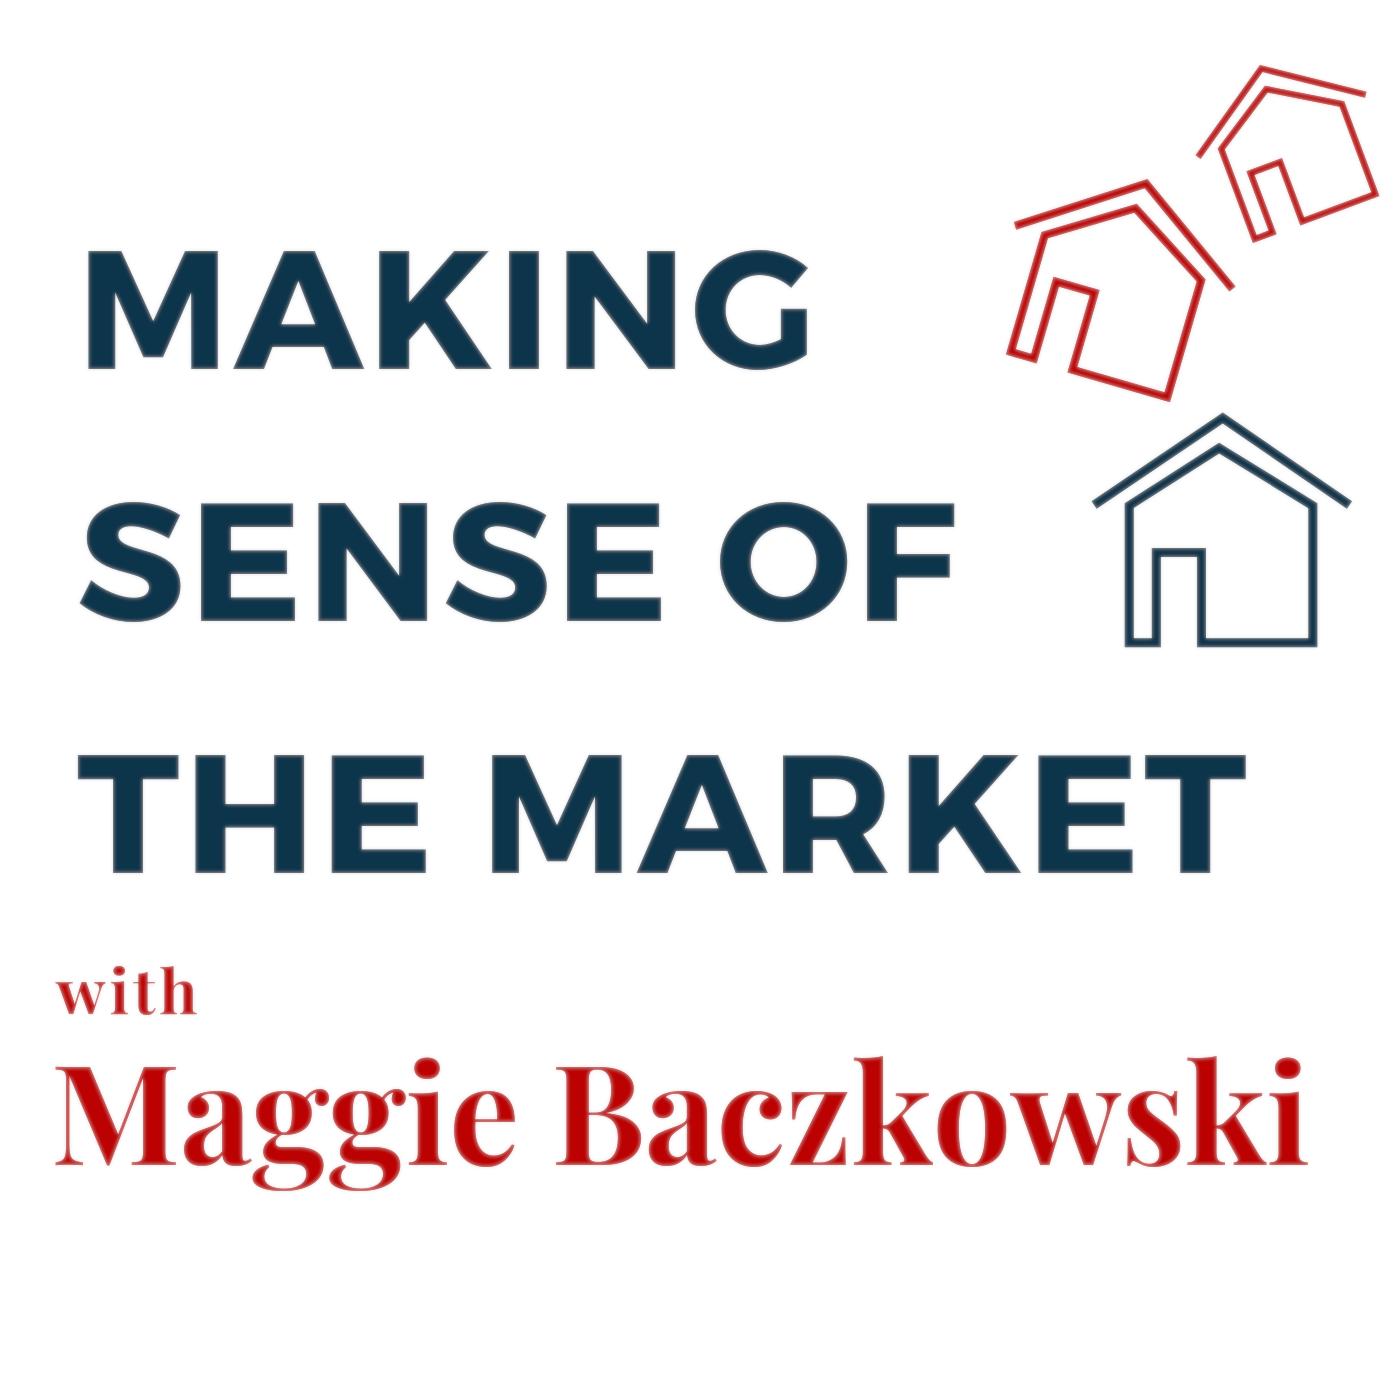 Making Sense of the Market with Maggie Baczkowski show art